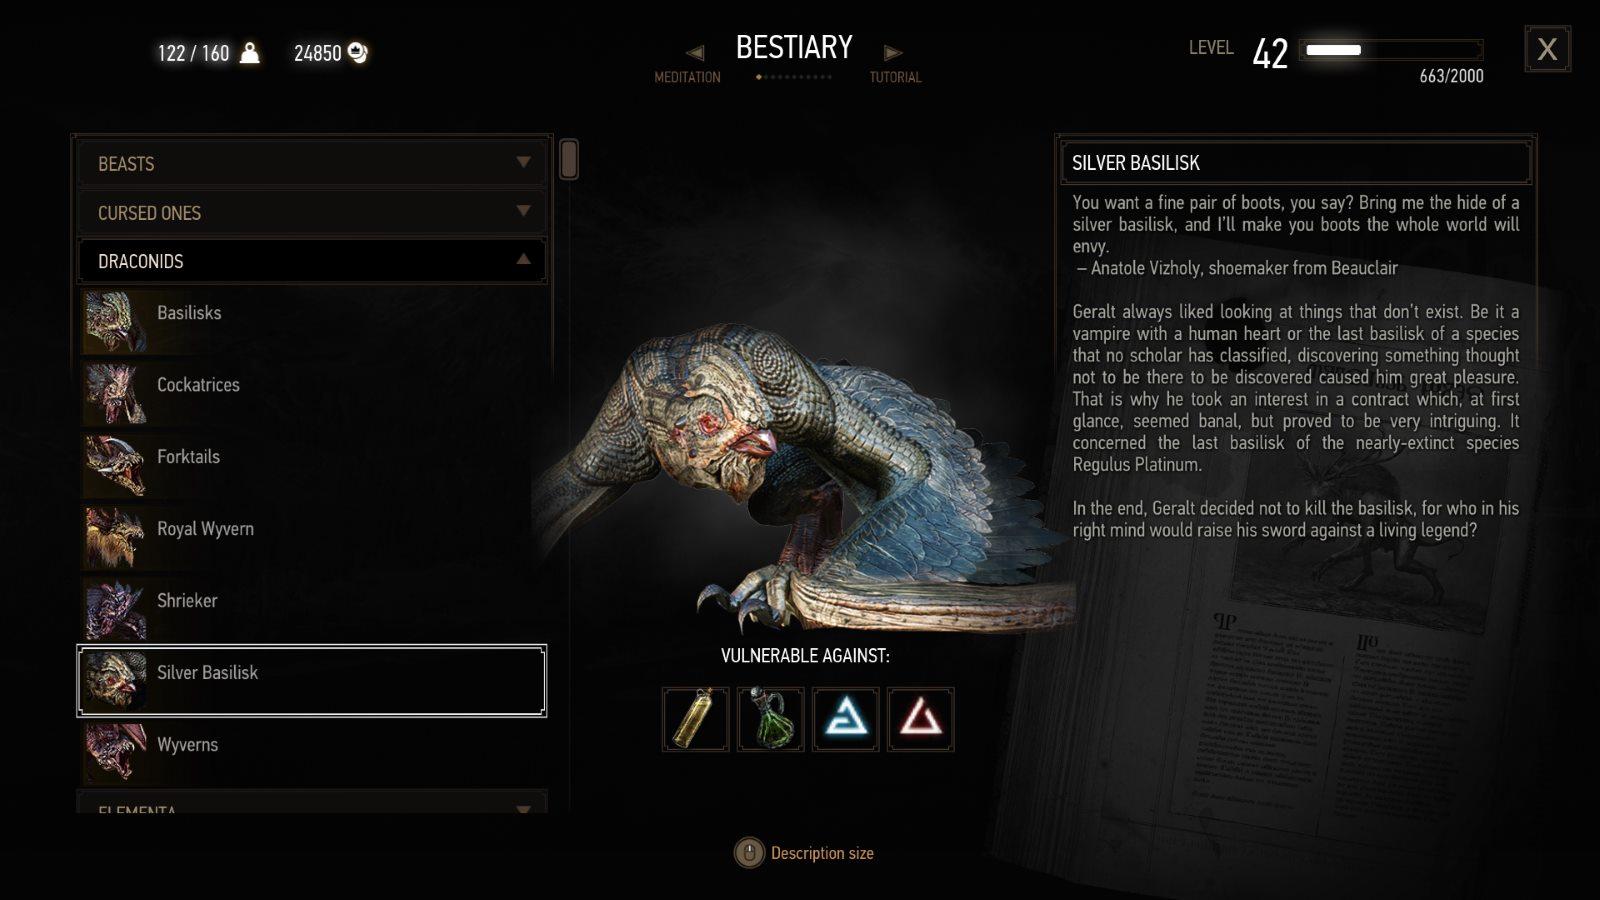 New Bestiary (3D) - The Witcher 3 Mod Talk - The Nexus Forums